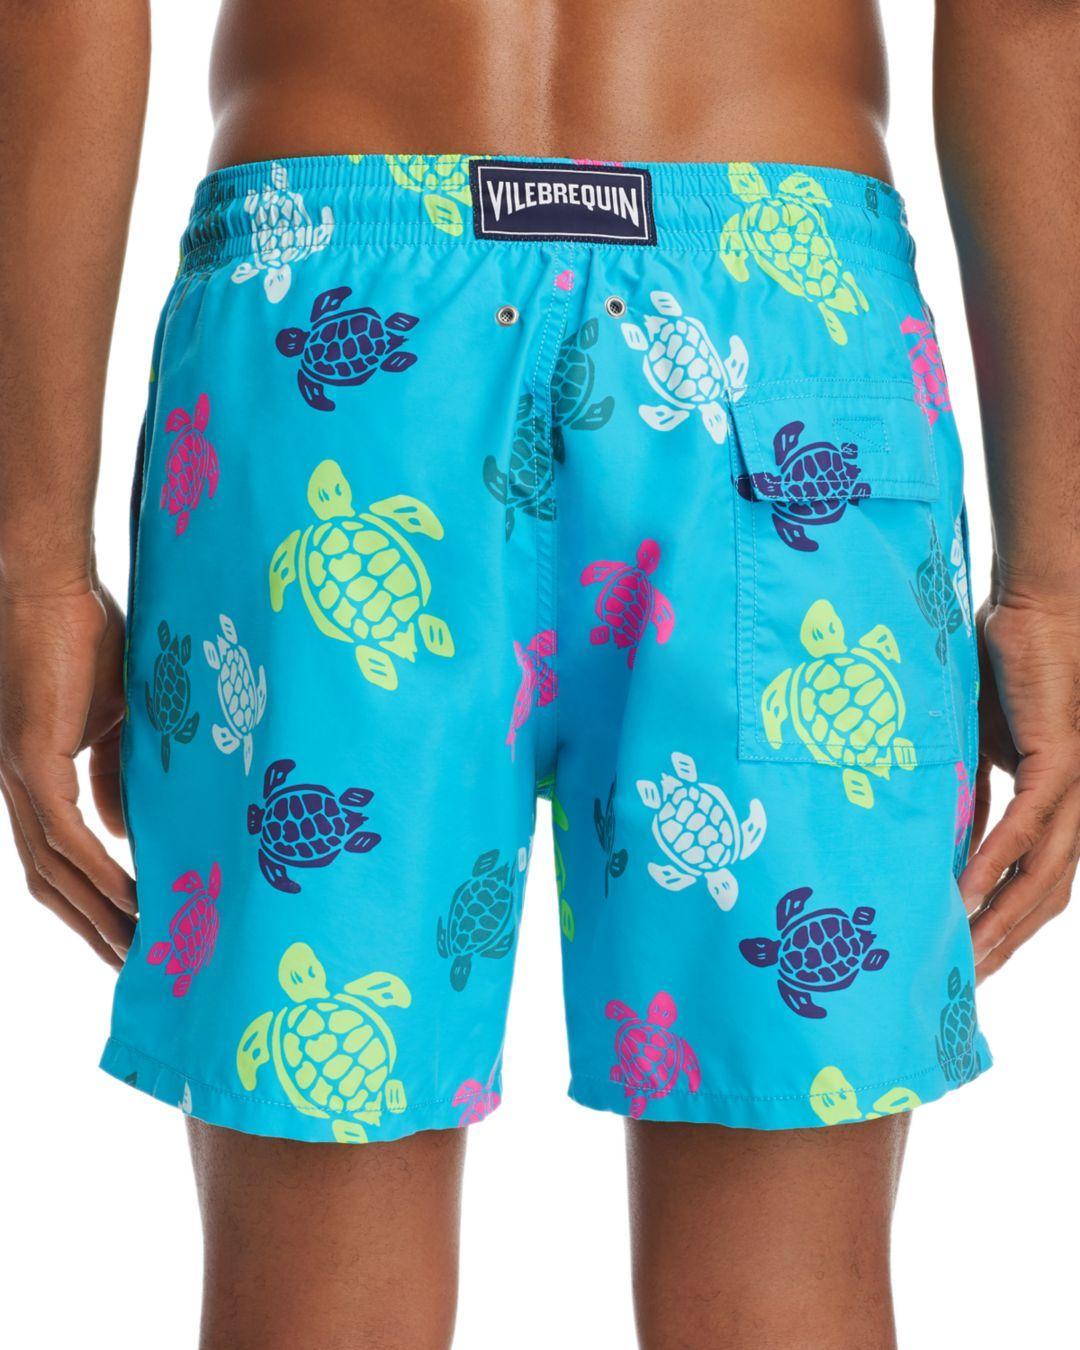 3f619830d7 ... Vilebrequin - Blue Moorea Multicolored Turtle - Print Swim Shorts for  Men - Lyst · Visit Bloomingdale's. Tap to visit site